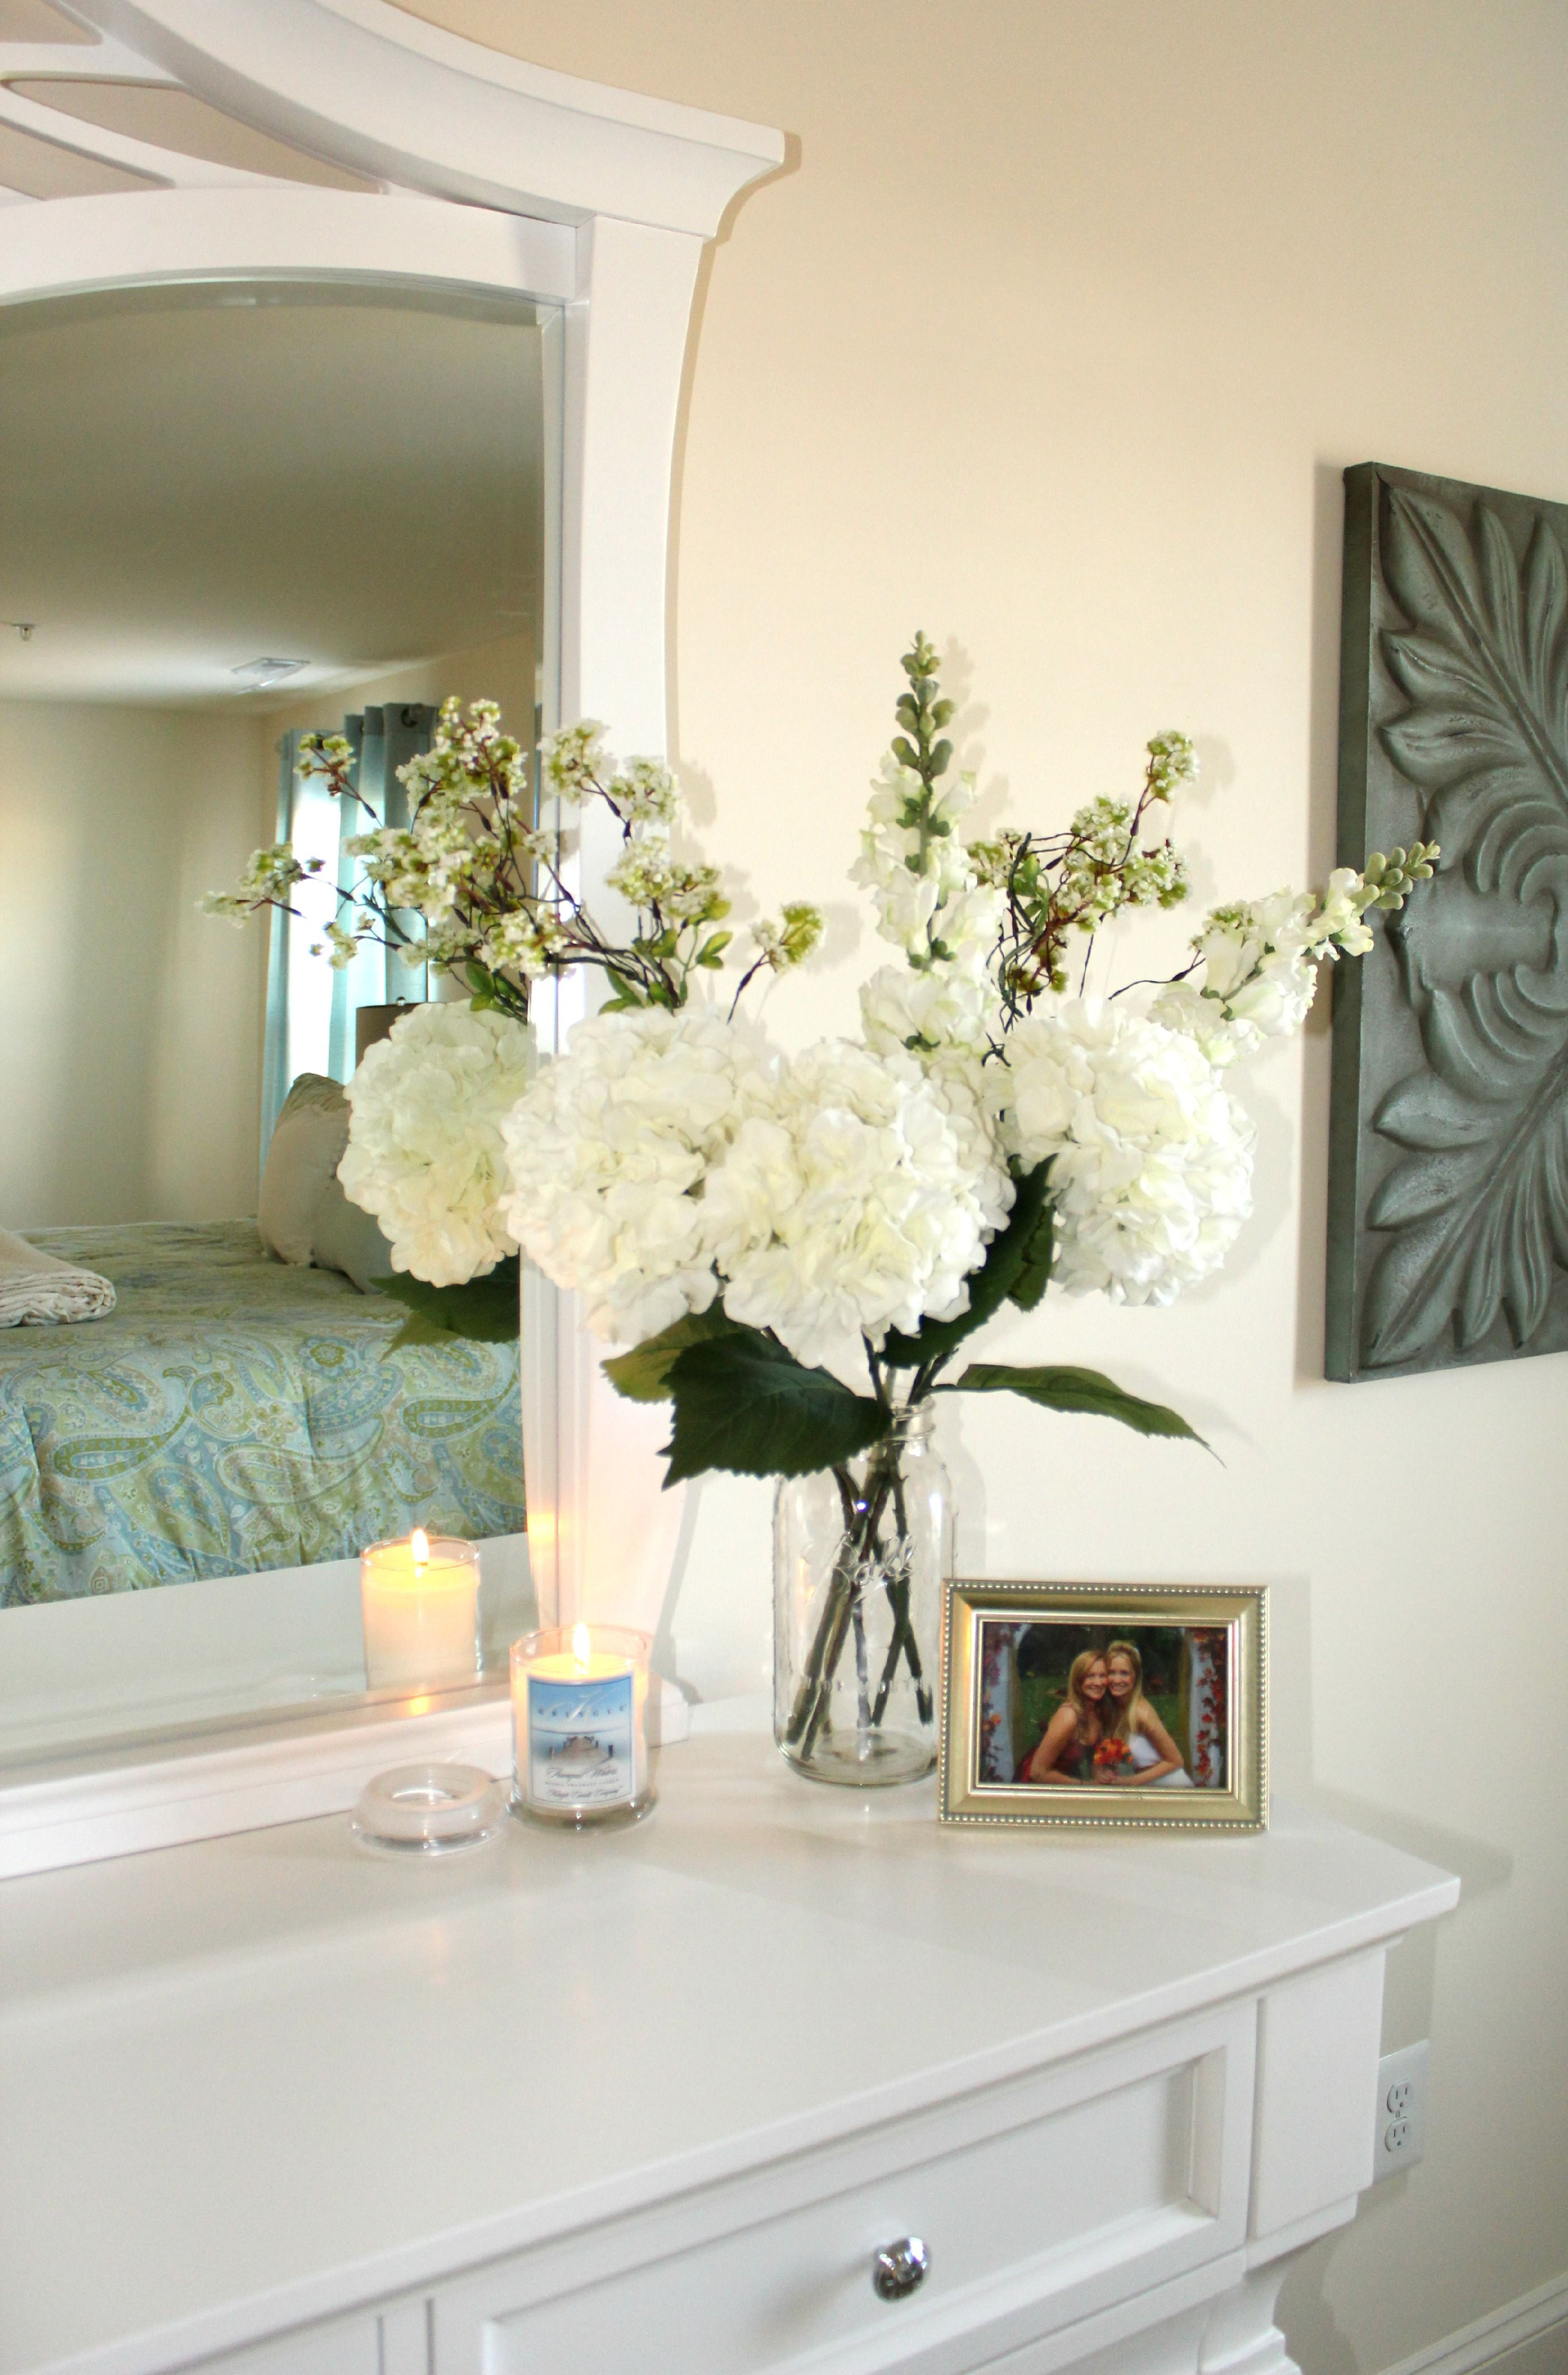 22 Floral Bathroom Designs Decorating Ideas: Master Bedroom Decor- BentleyBlonde House Tour